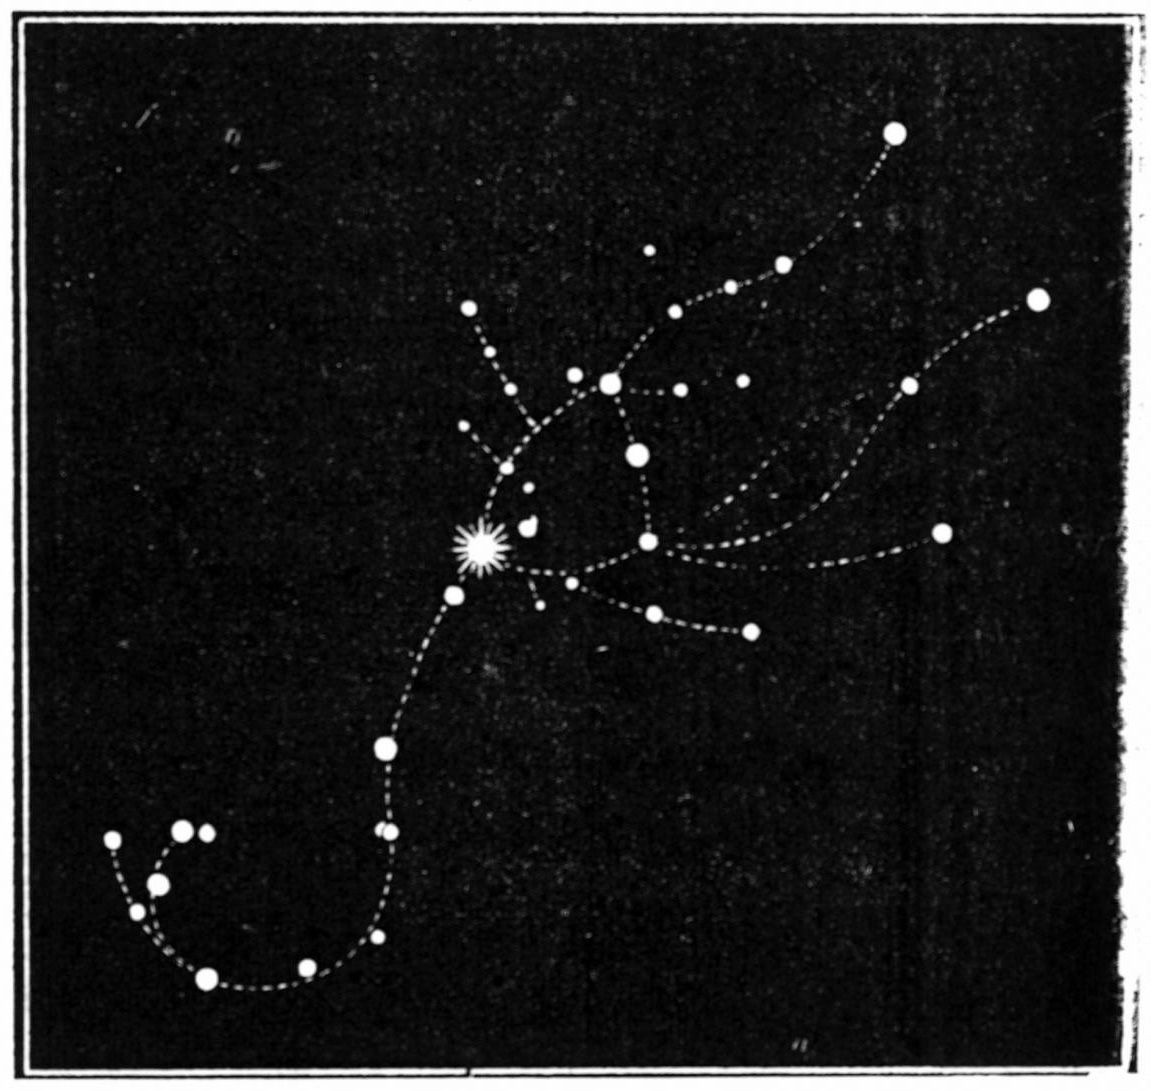 Scorpius Constellation Tattoo The Scorpio Constellation Body Art